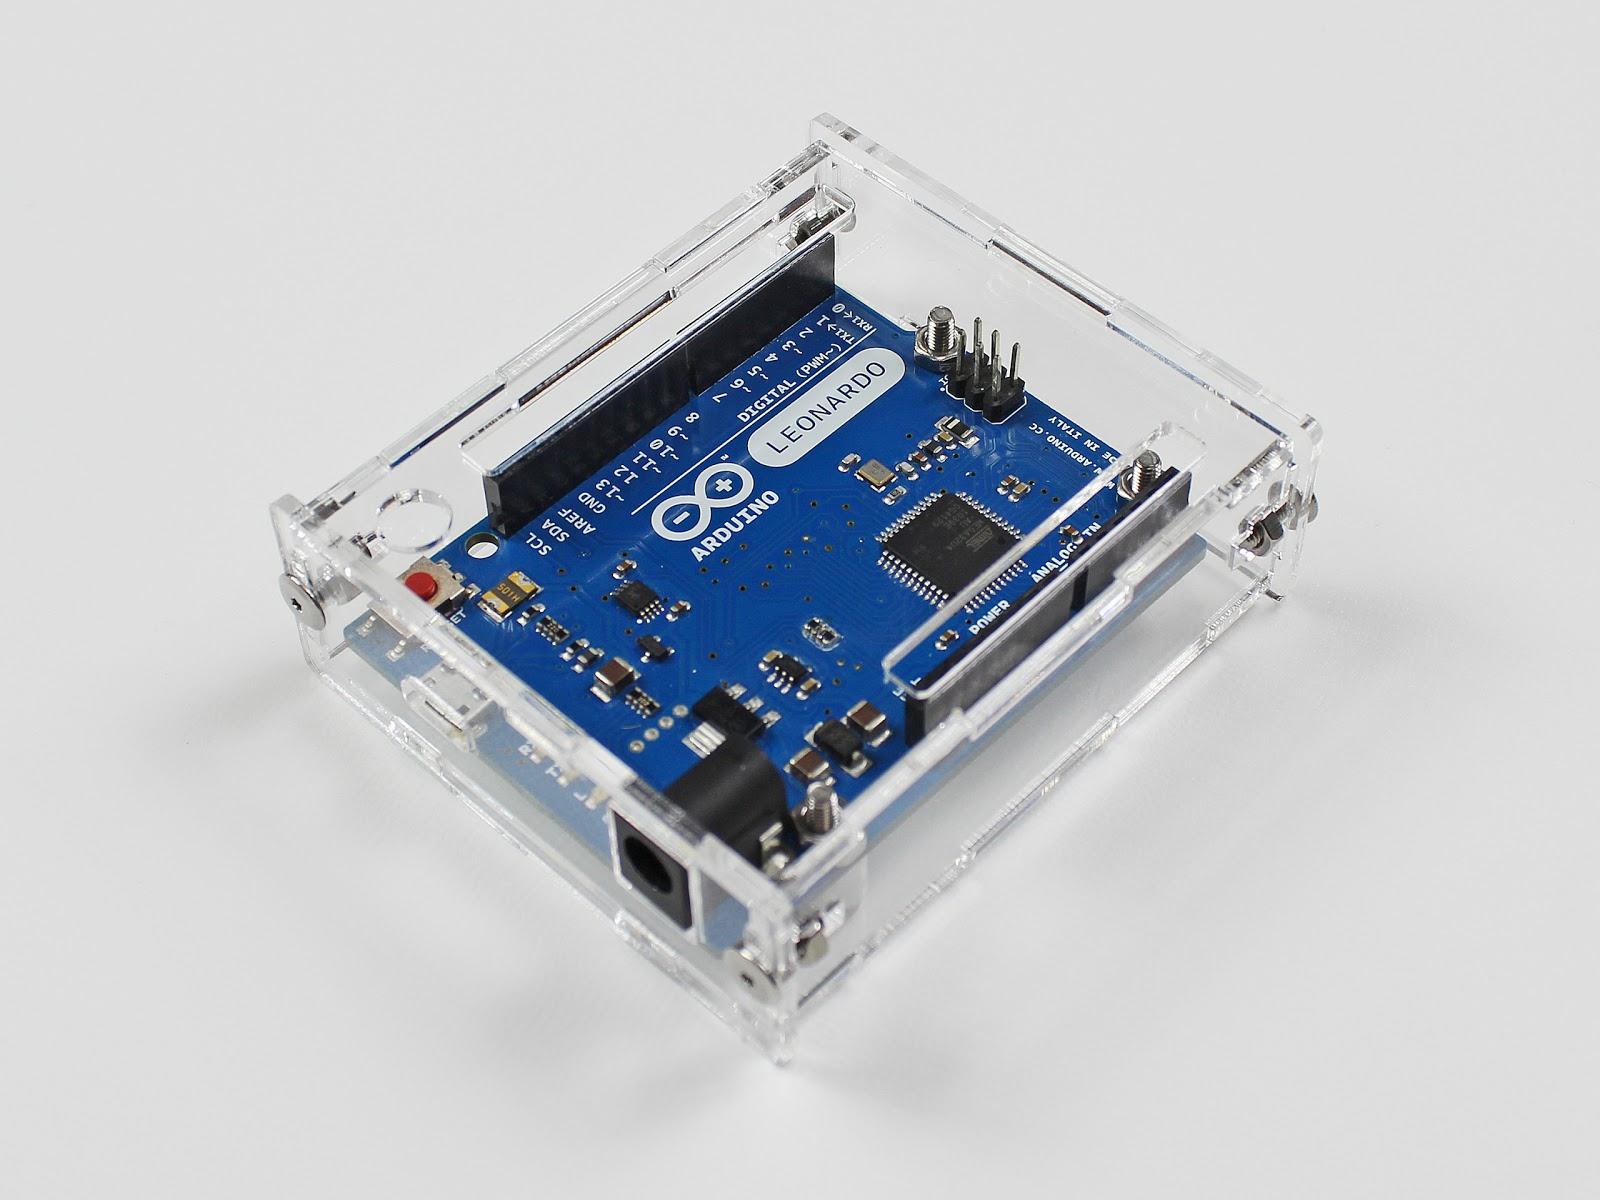 Arduino Leonardoケースのレーザーカット